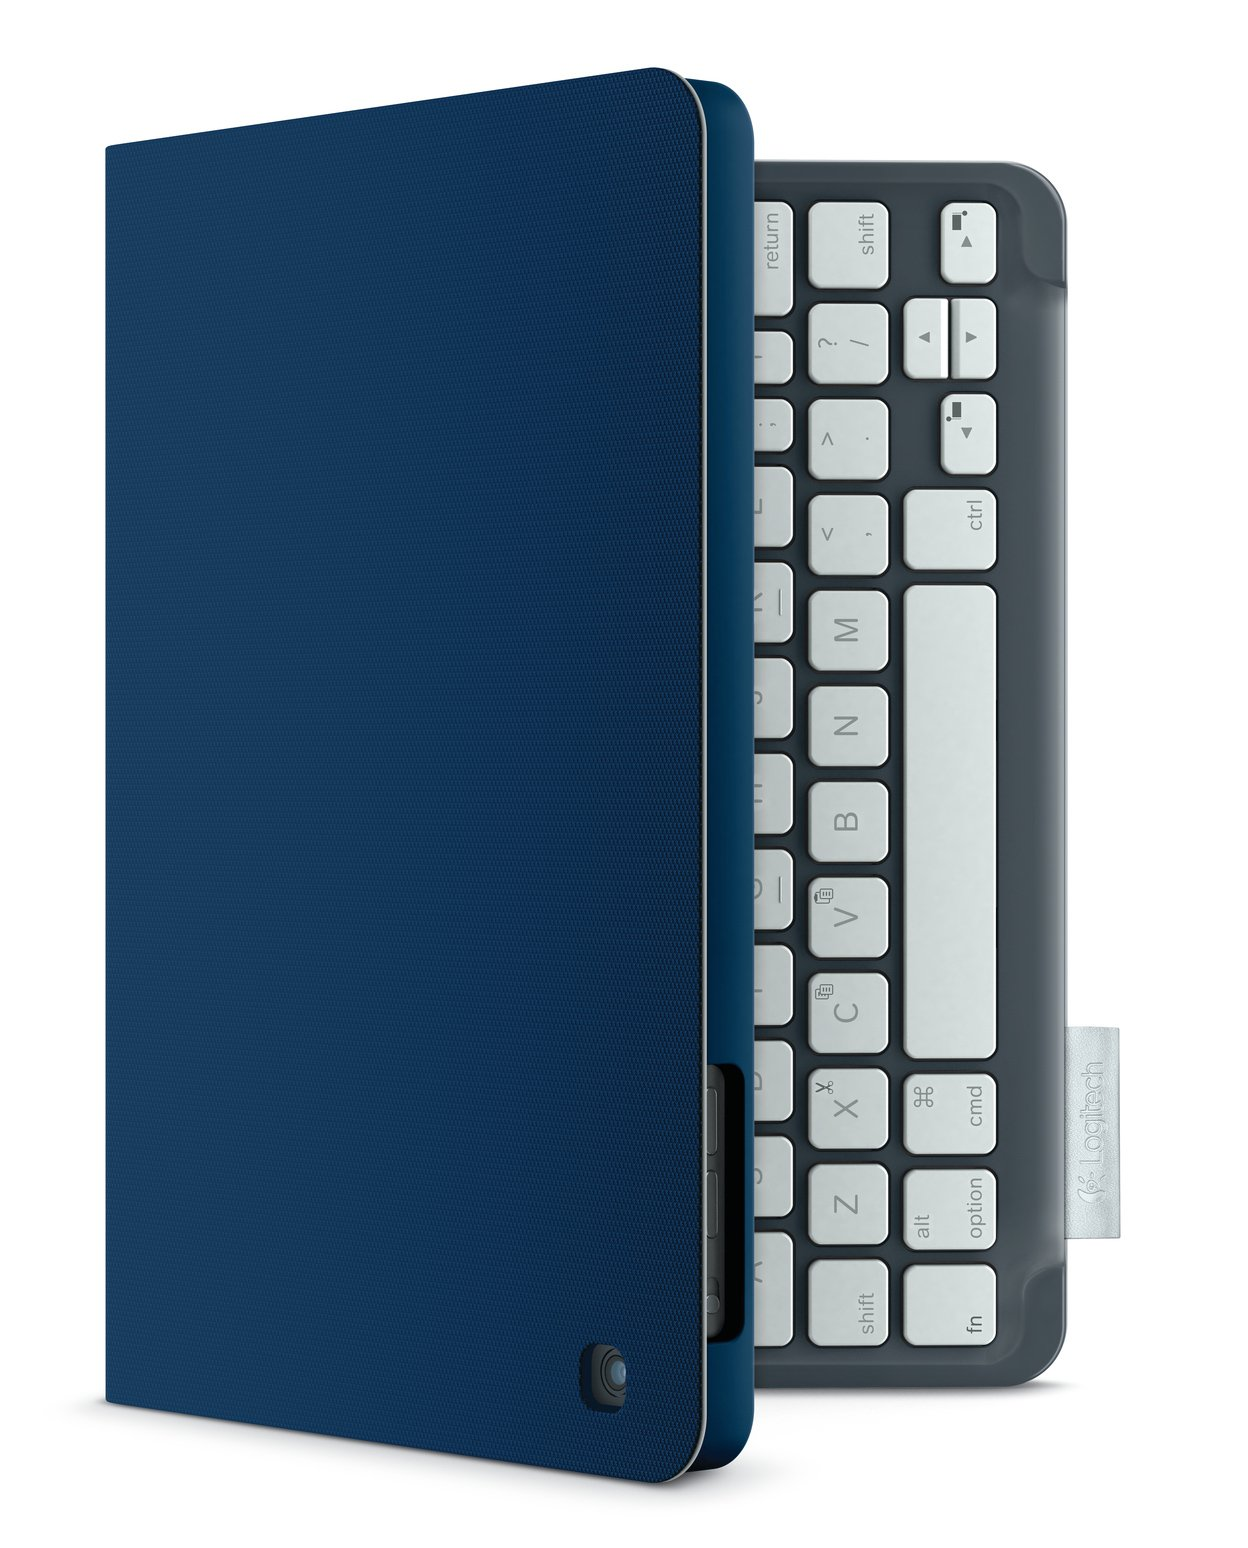 Logitech Keyboard Folio for iPad Mini - Mystic Blue 920-005338